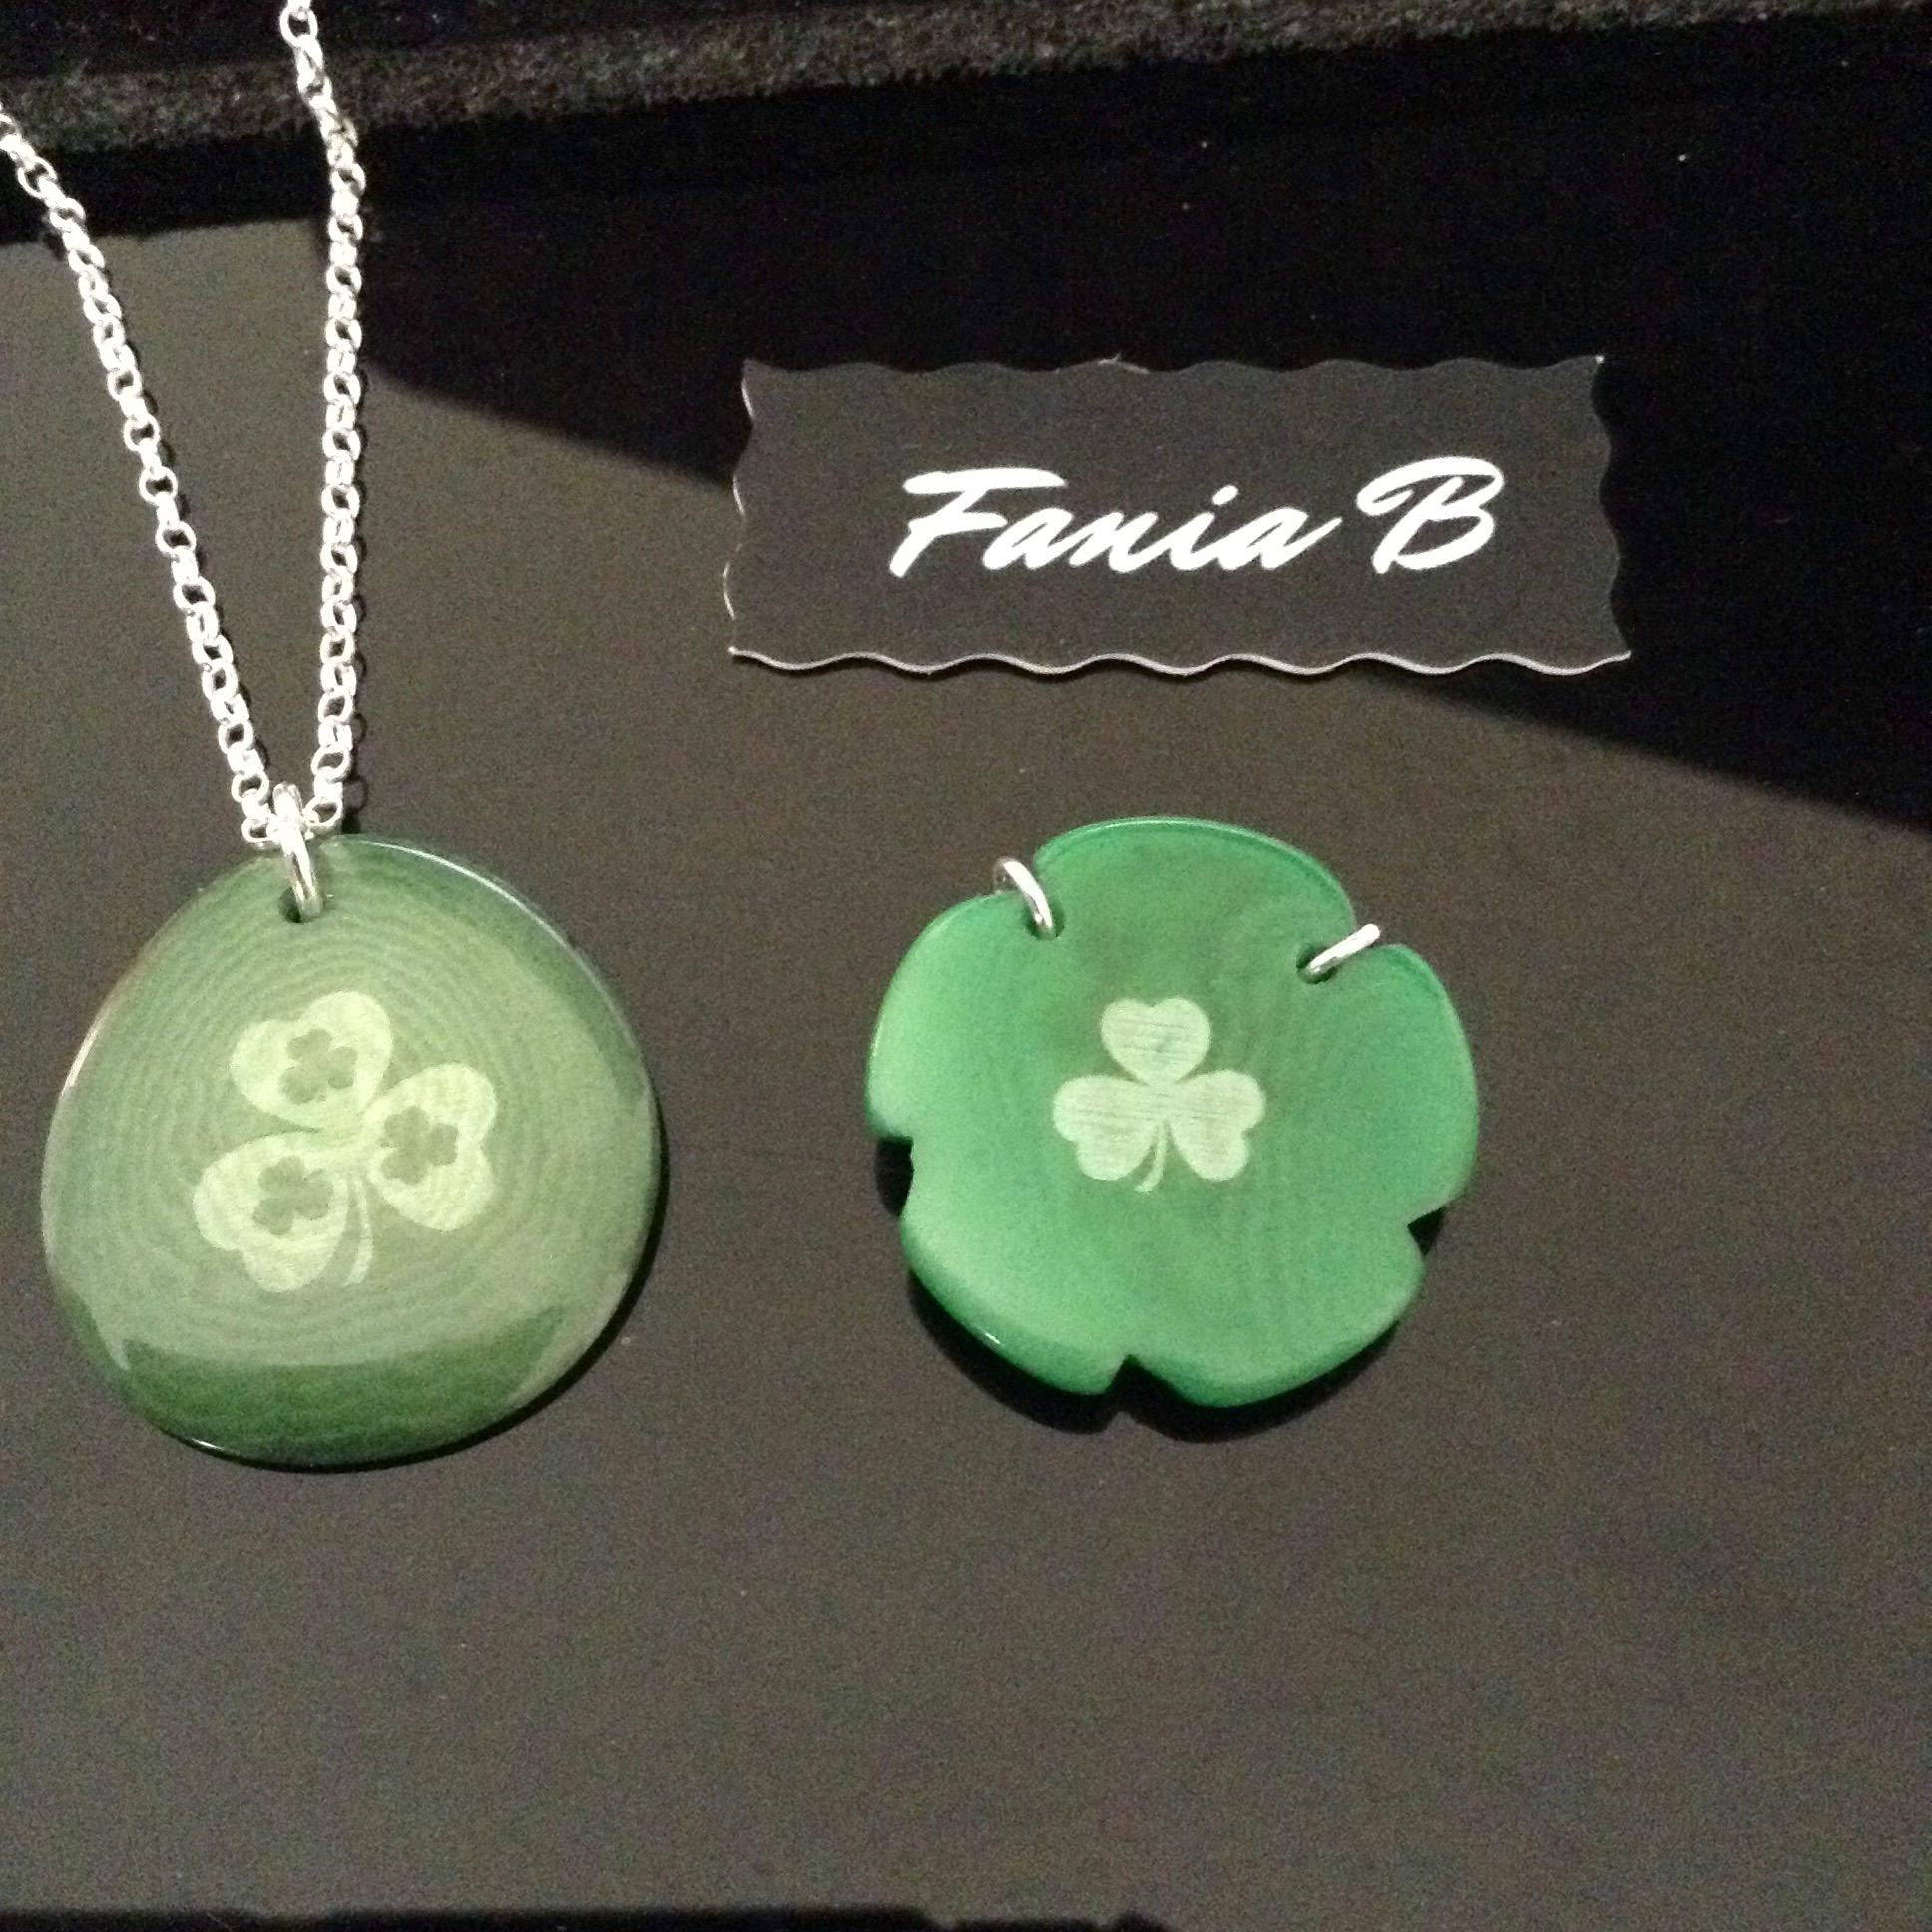 Clover pendants